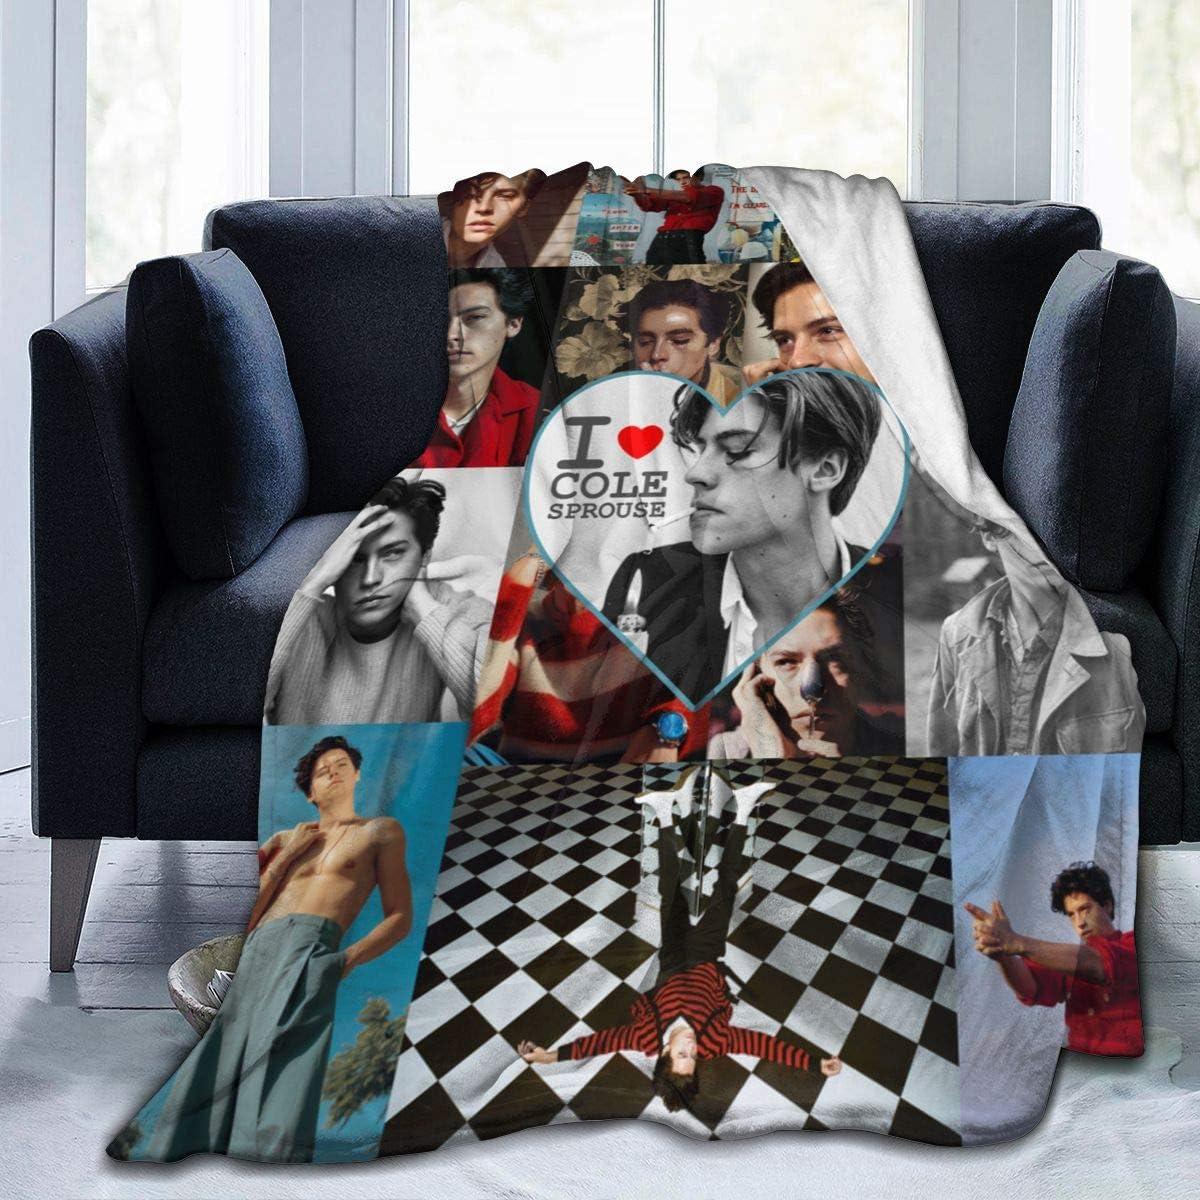 Bestrgi Ultra-Soft Micro Special price Flannel Fleece 3D Printing Livi Blanket Product